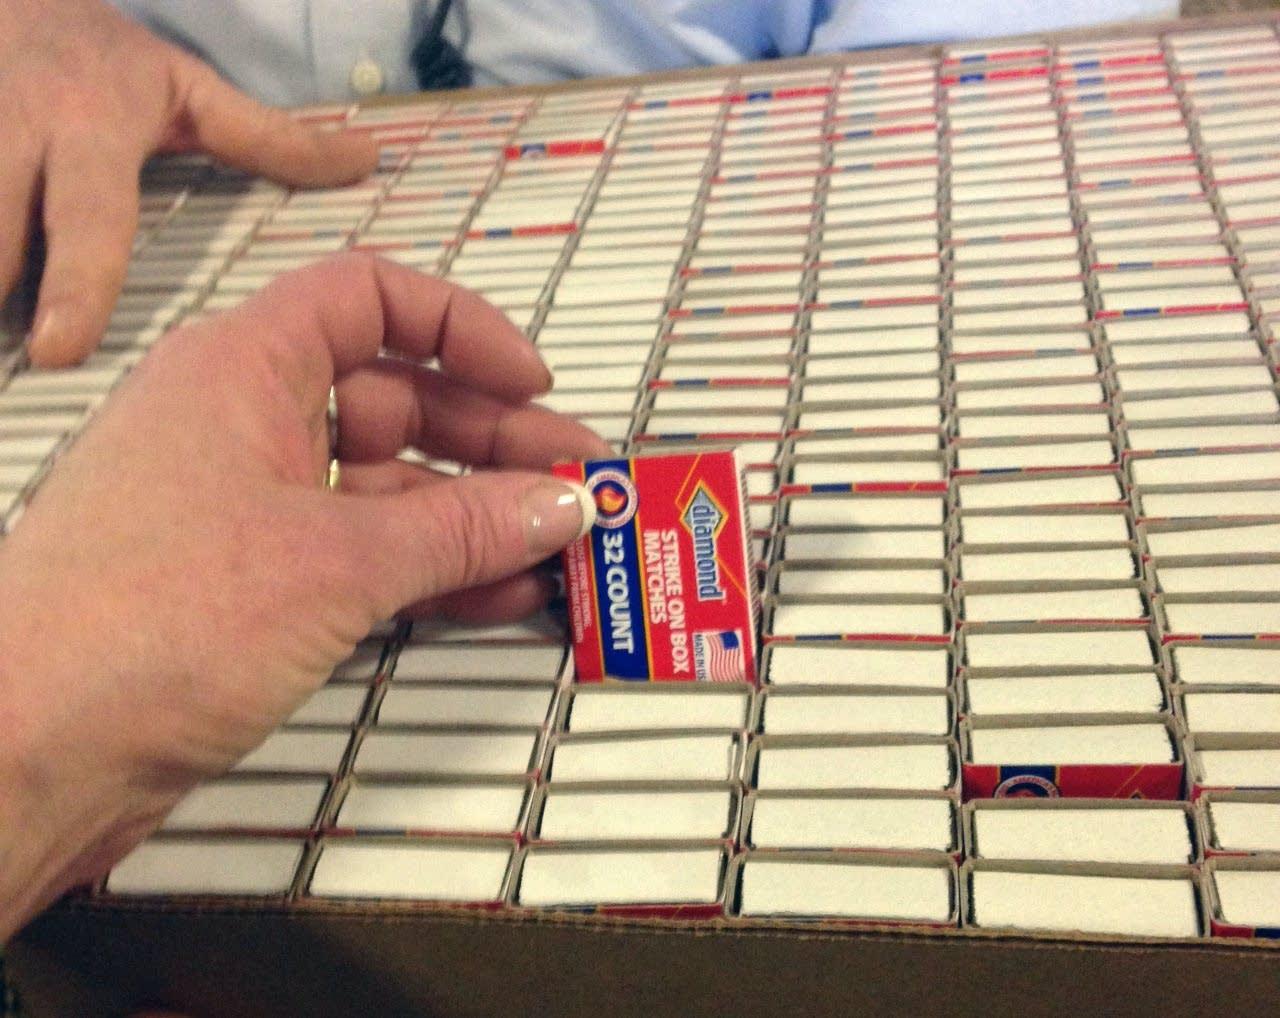 A box full of Diamond matches.